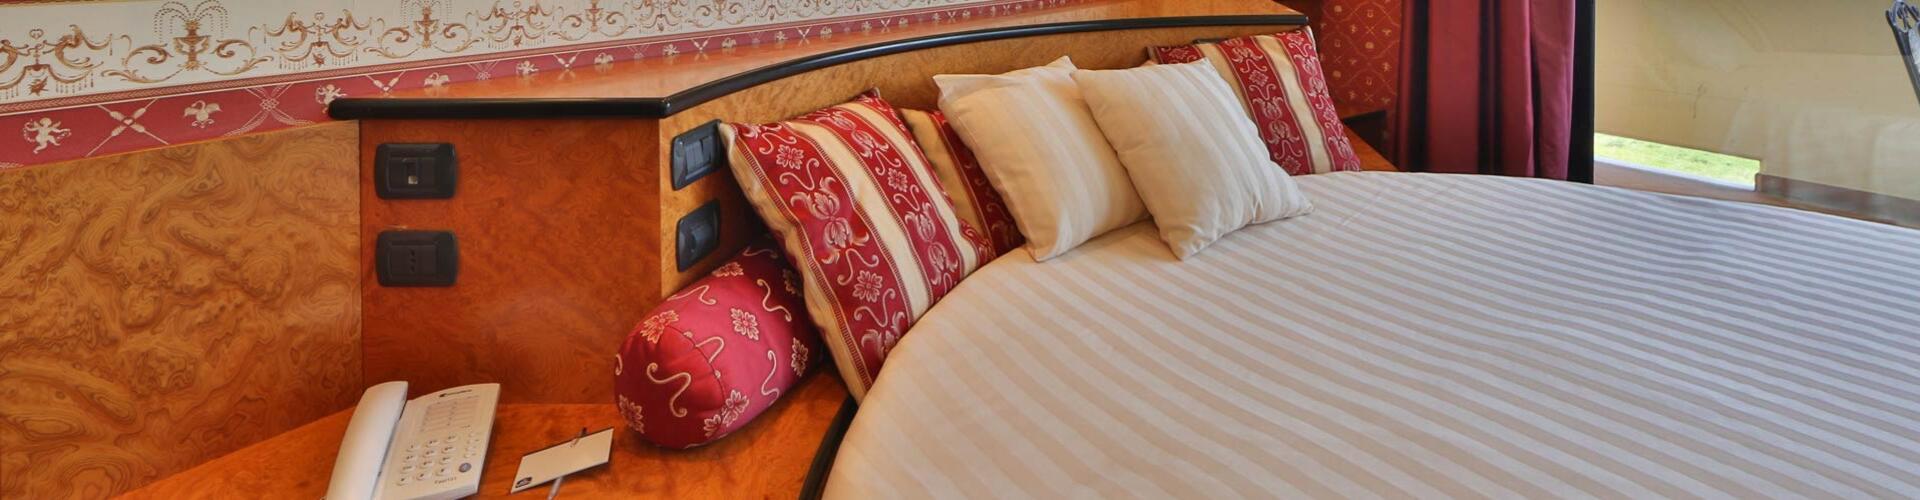 hoteldavidpalace en rooms 001